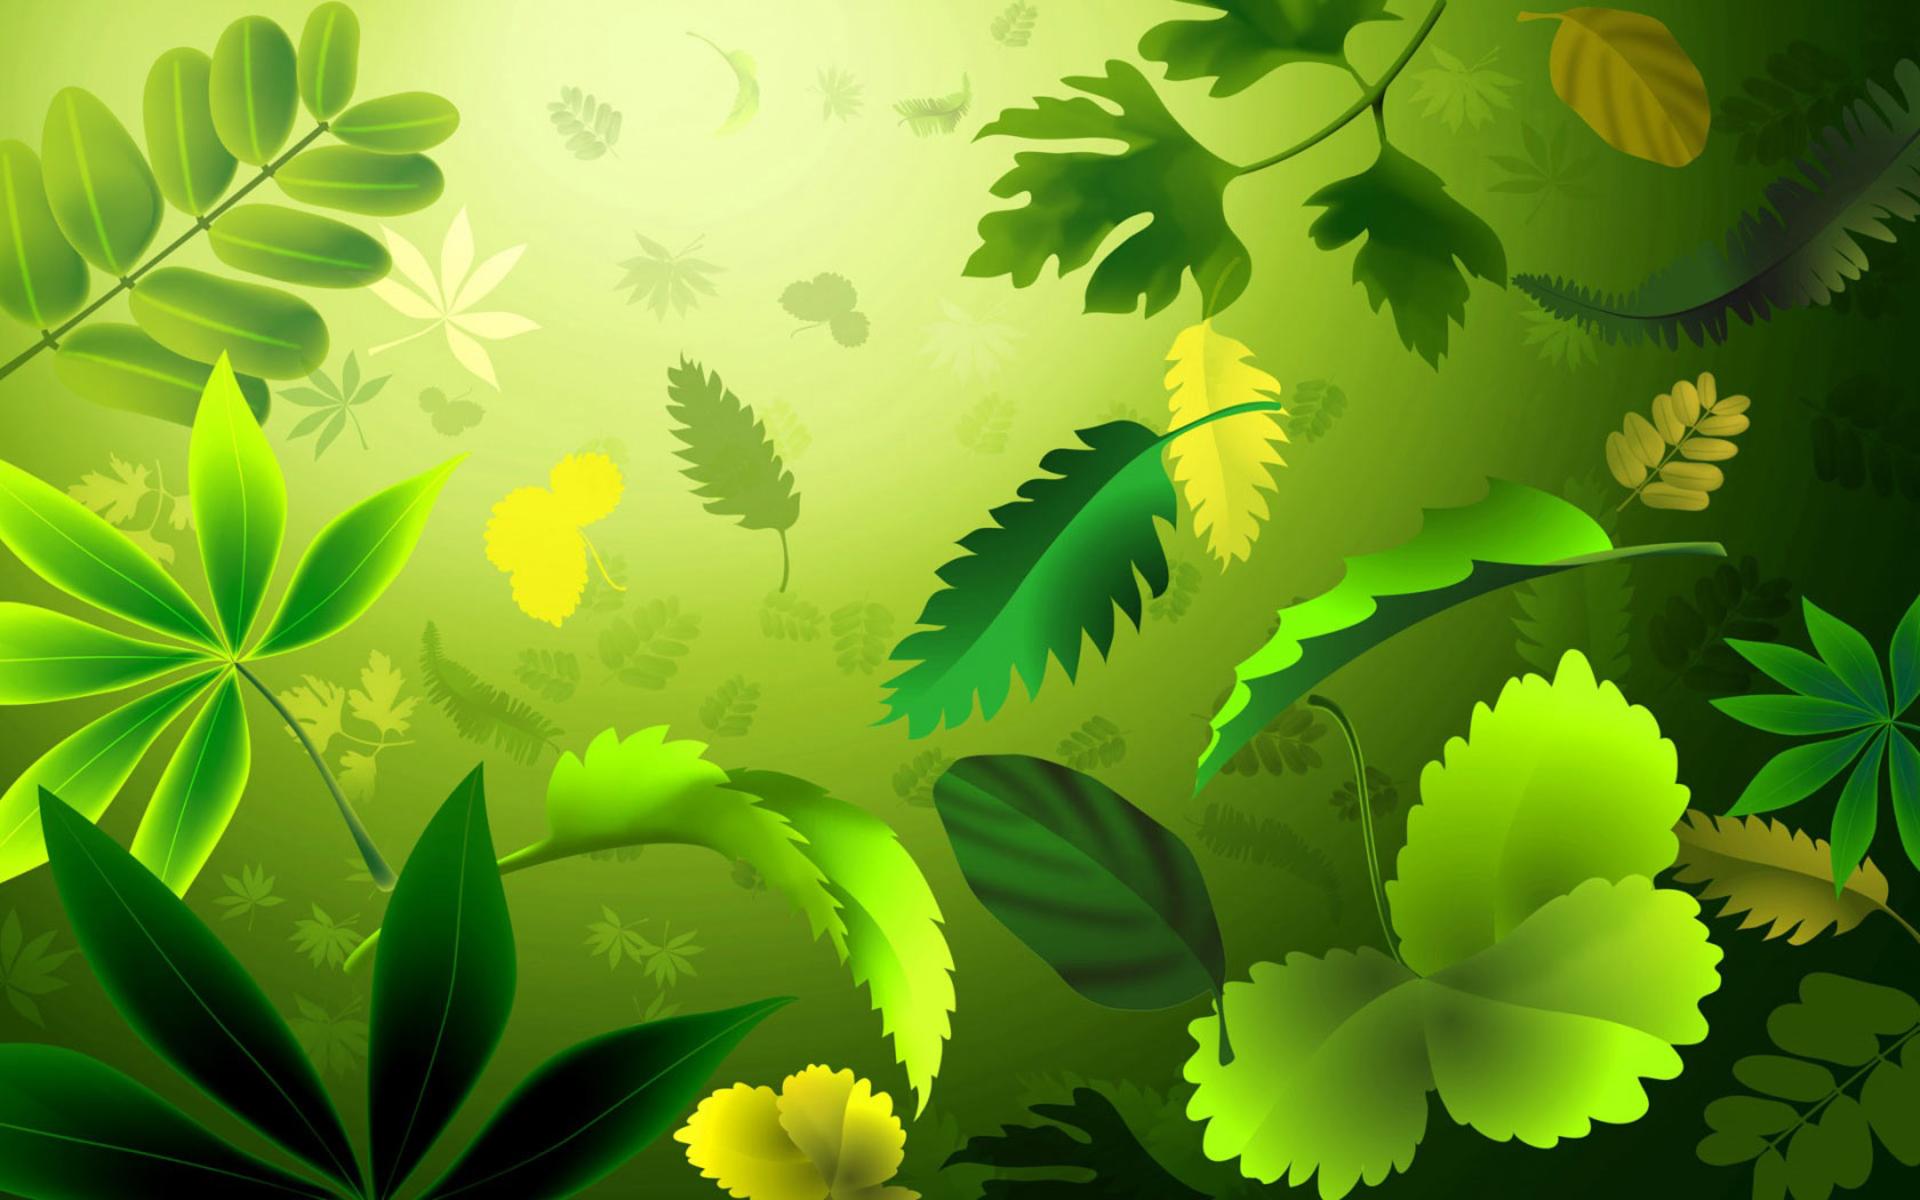 Jungle background clipart 4